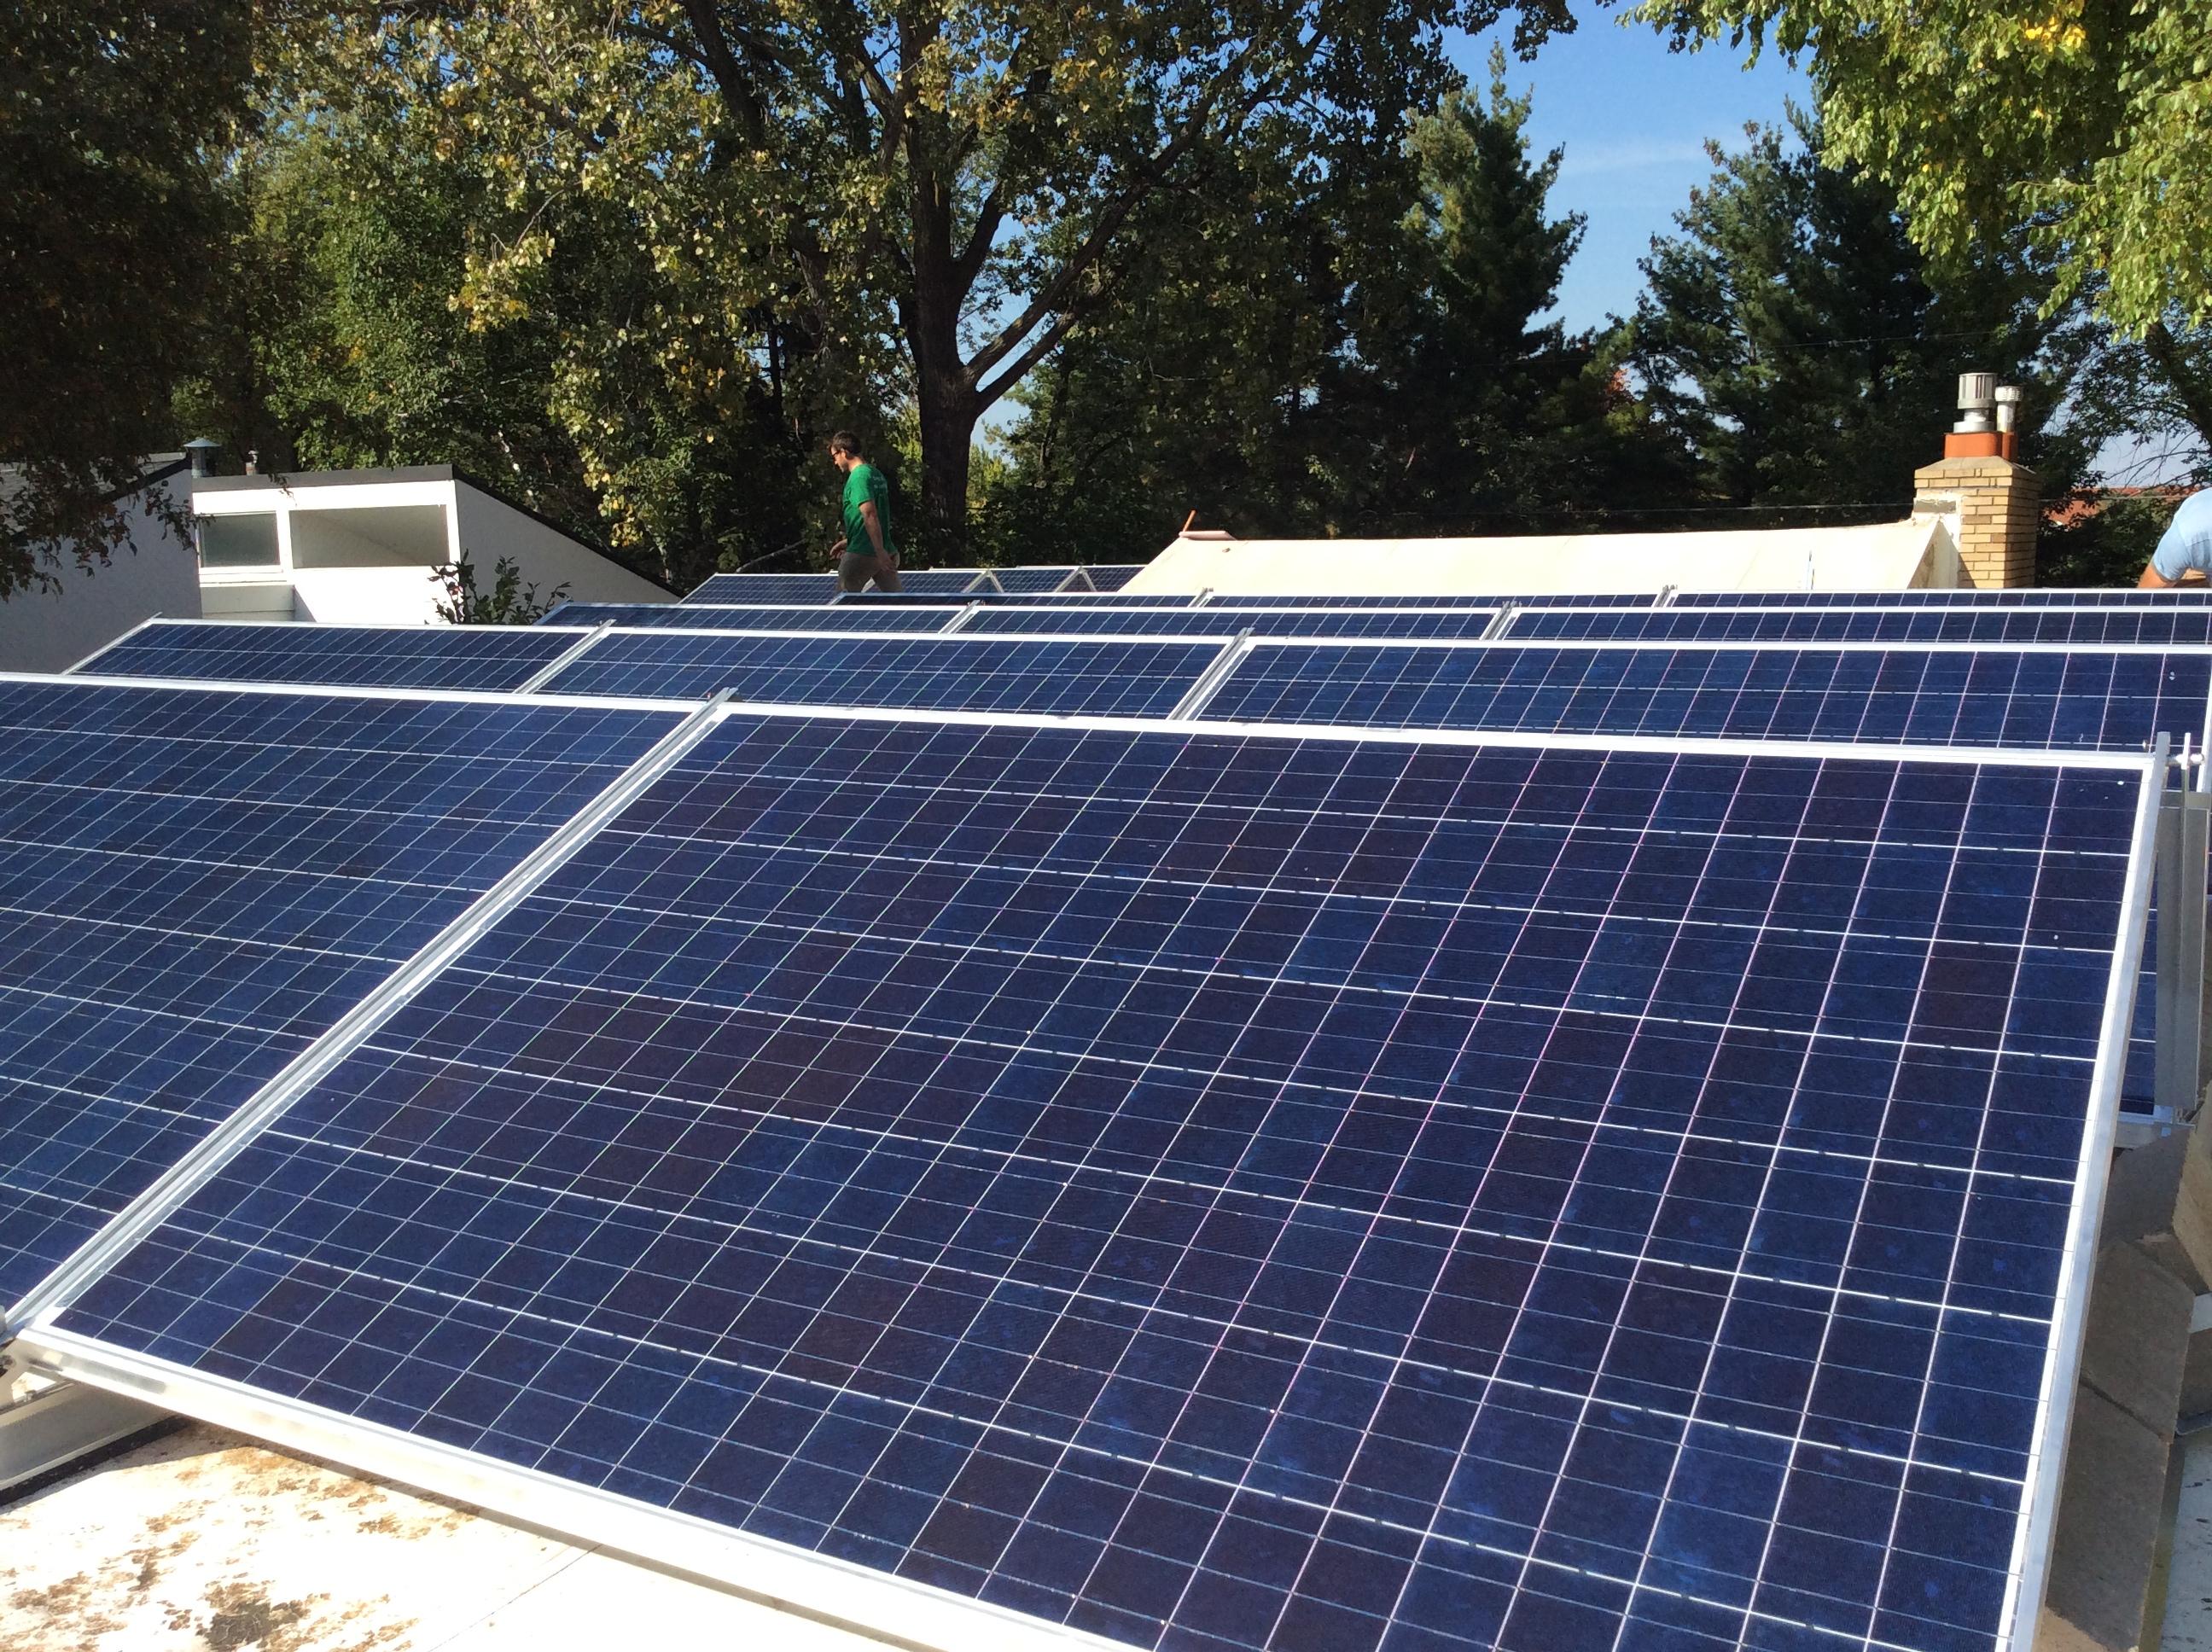 austin utilities solar energy rebate program minnesota